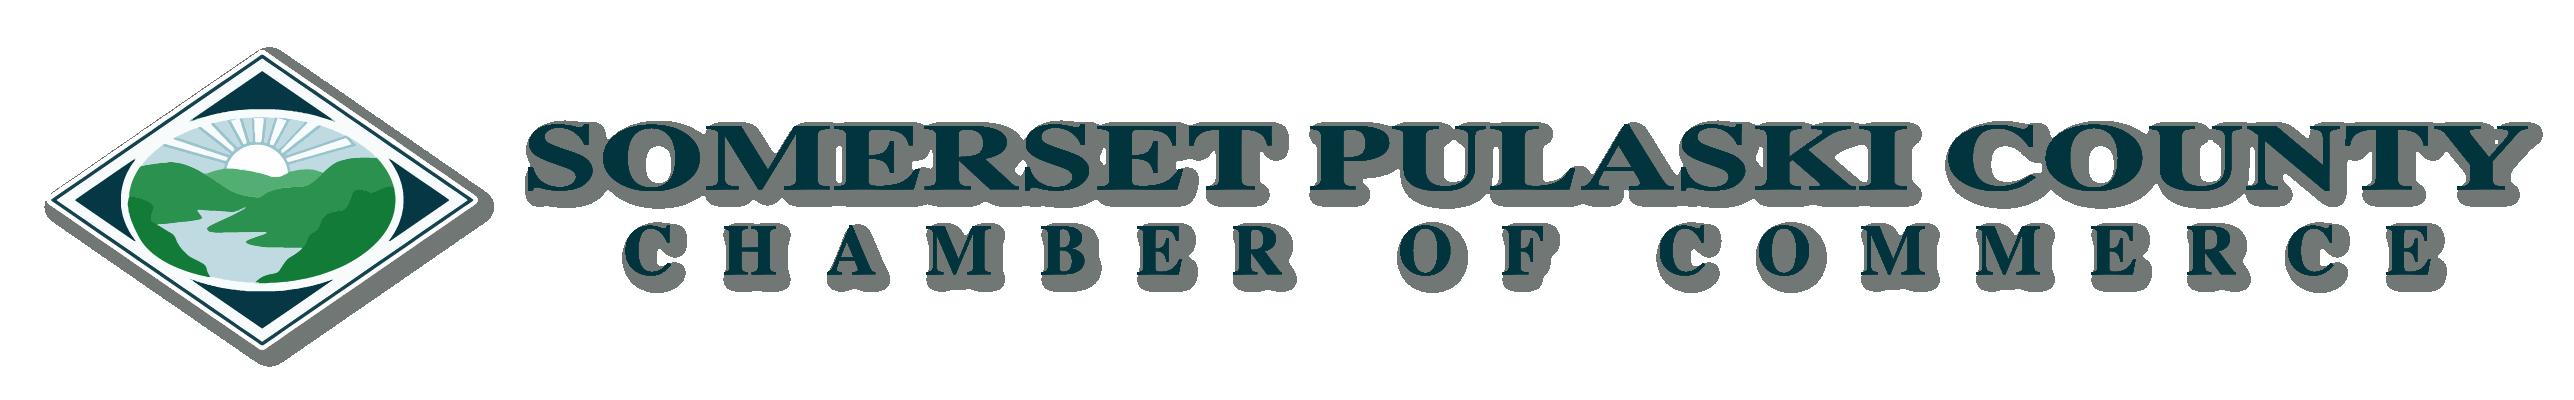 somersetpulaskichamber Logo